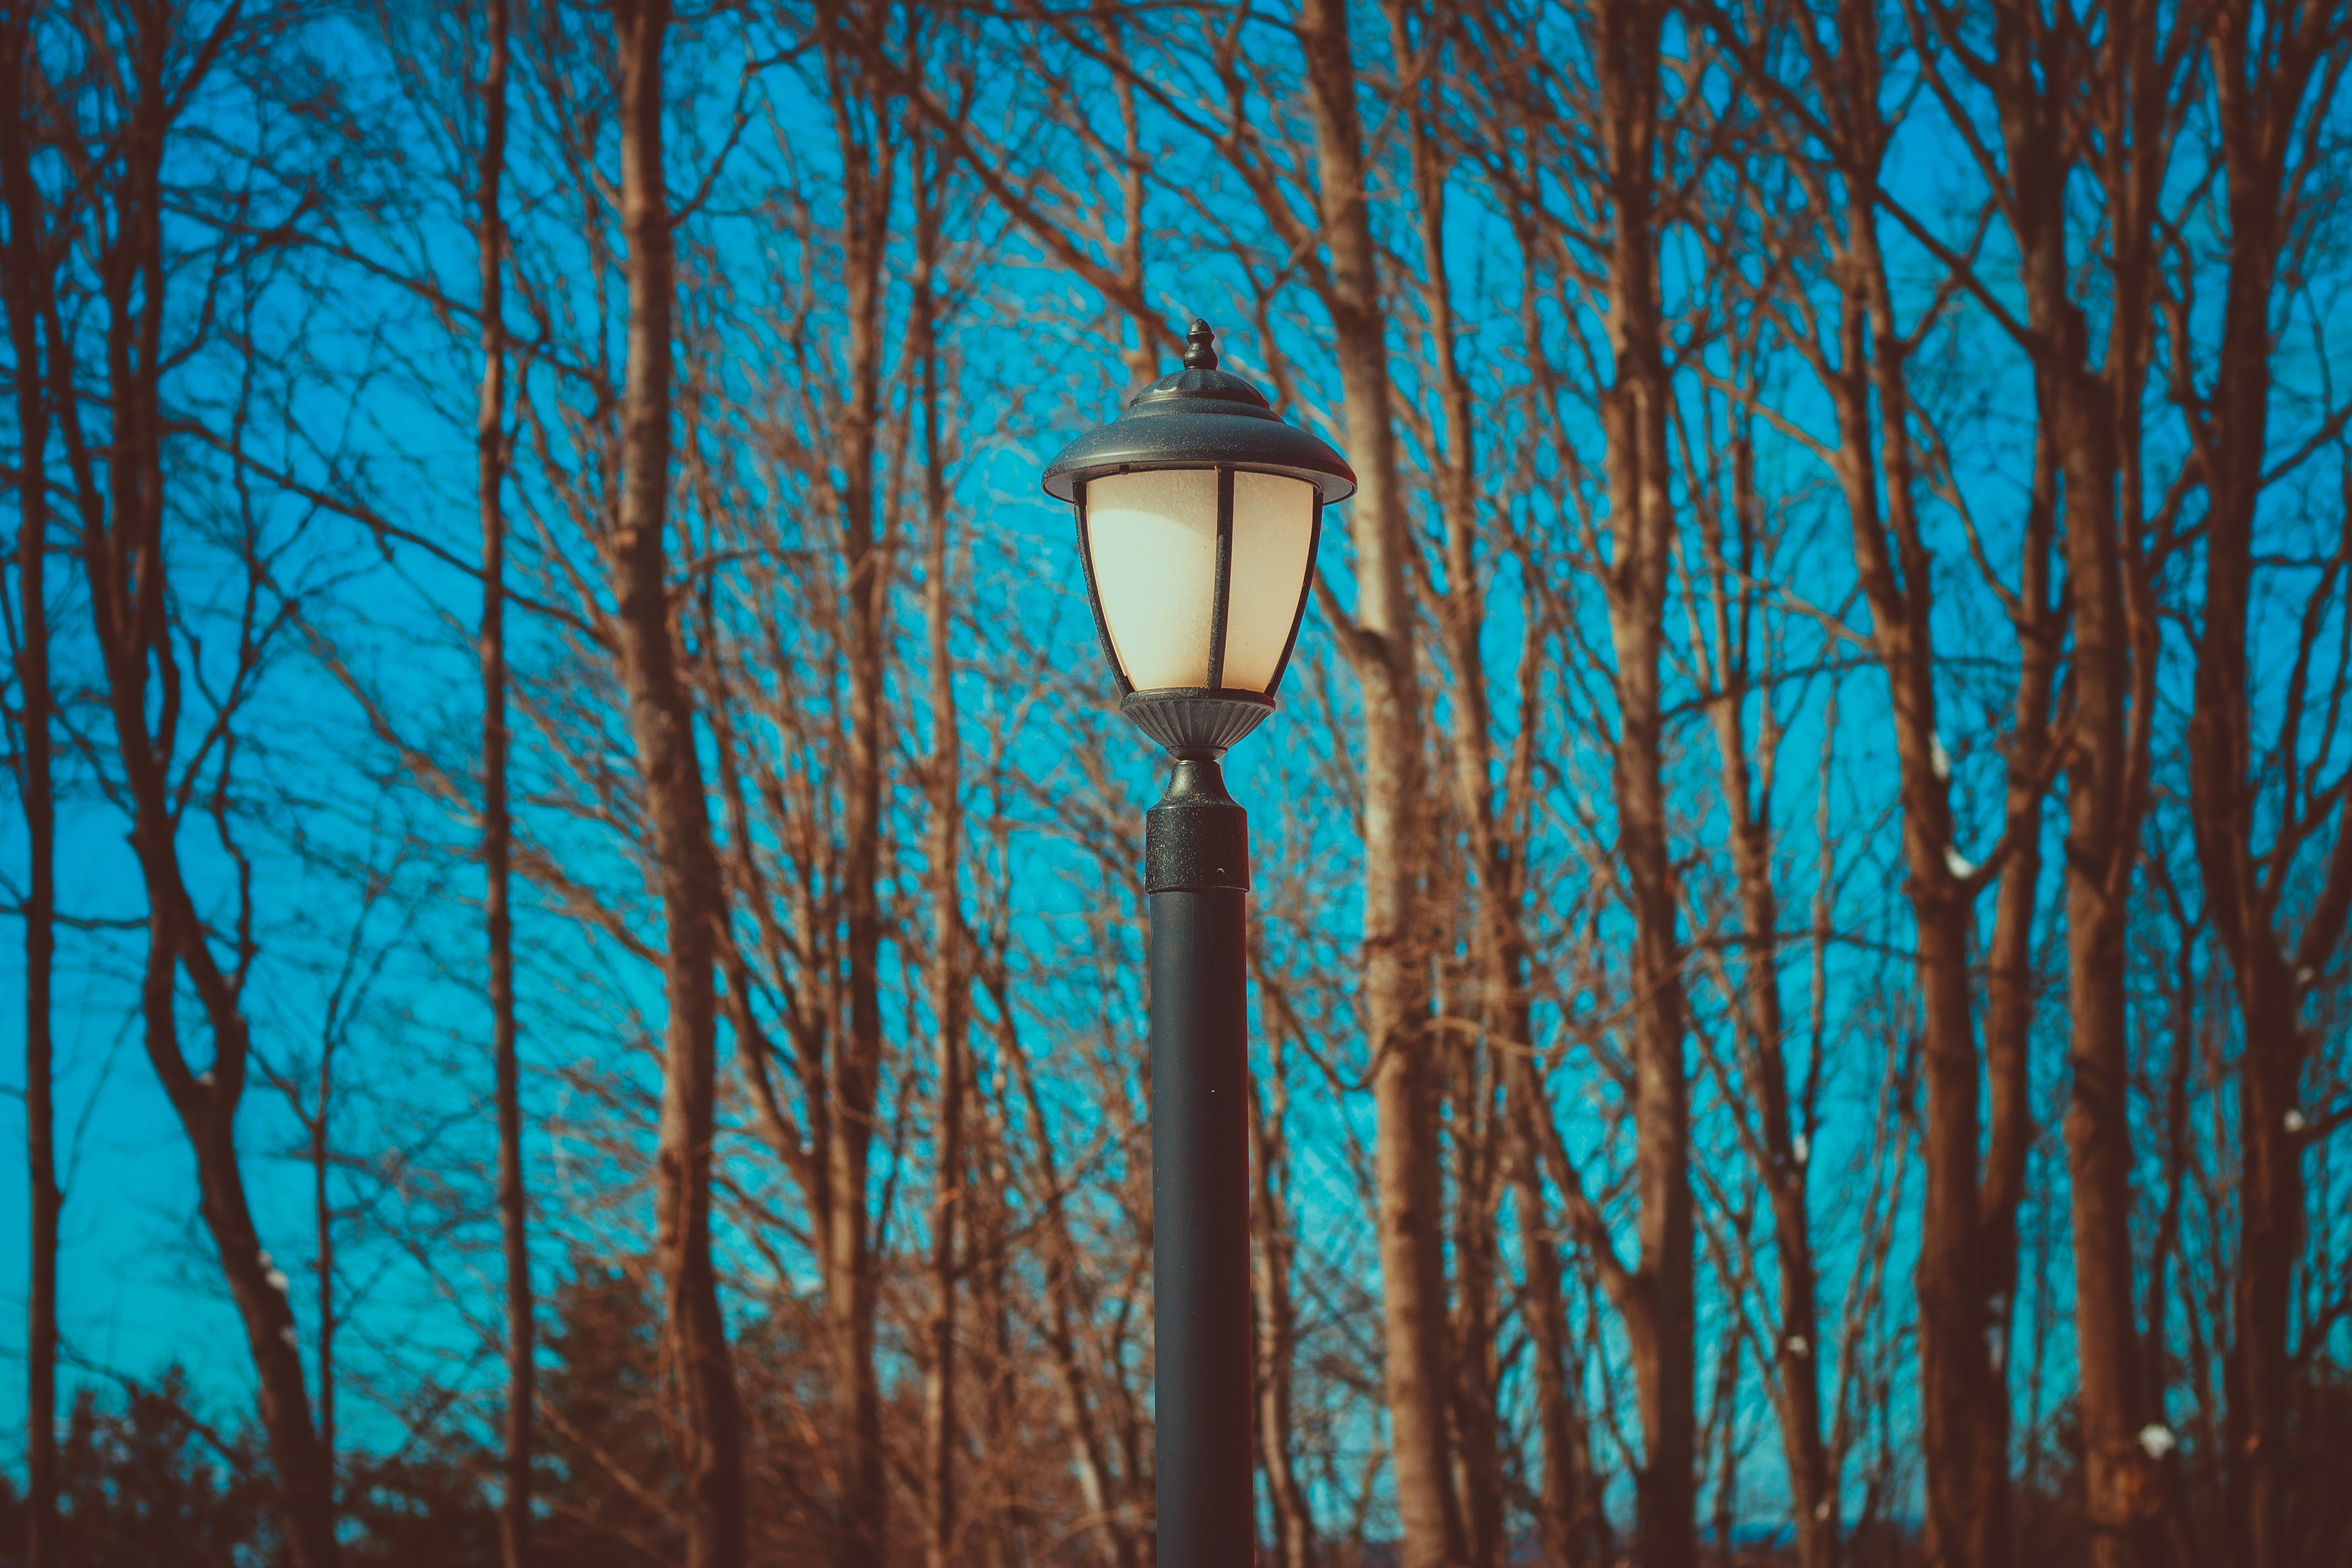 Black Lamp Post Near Leafless Trees